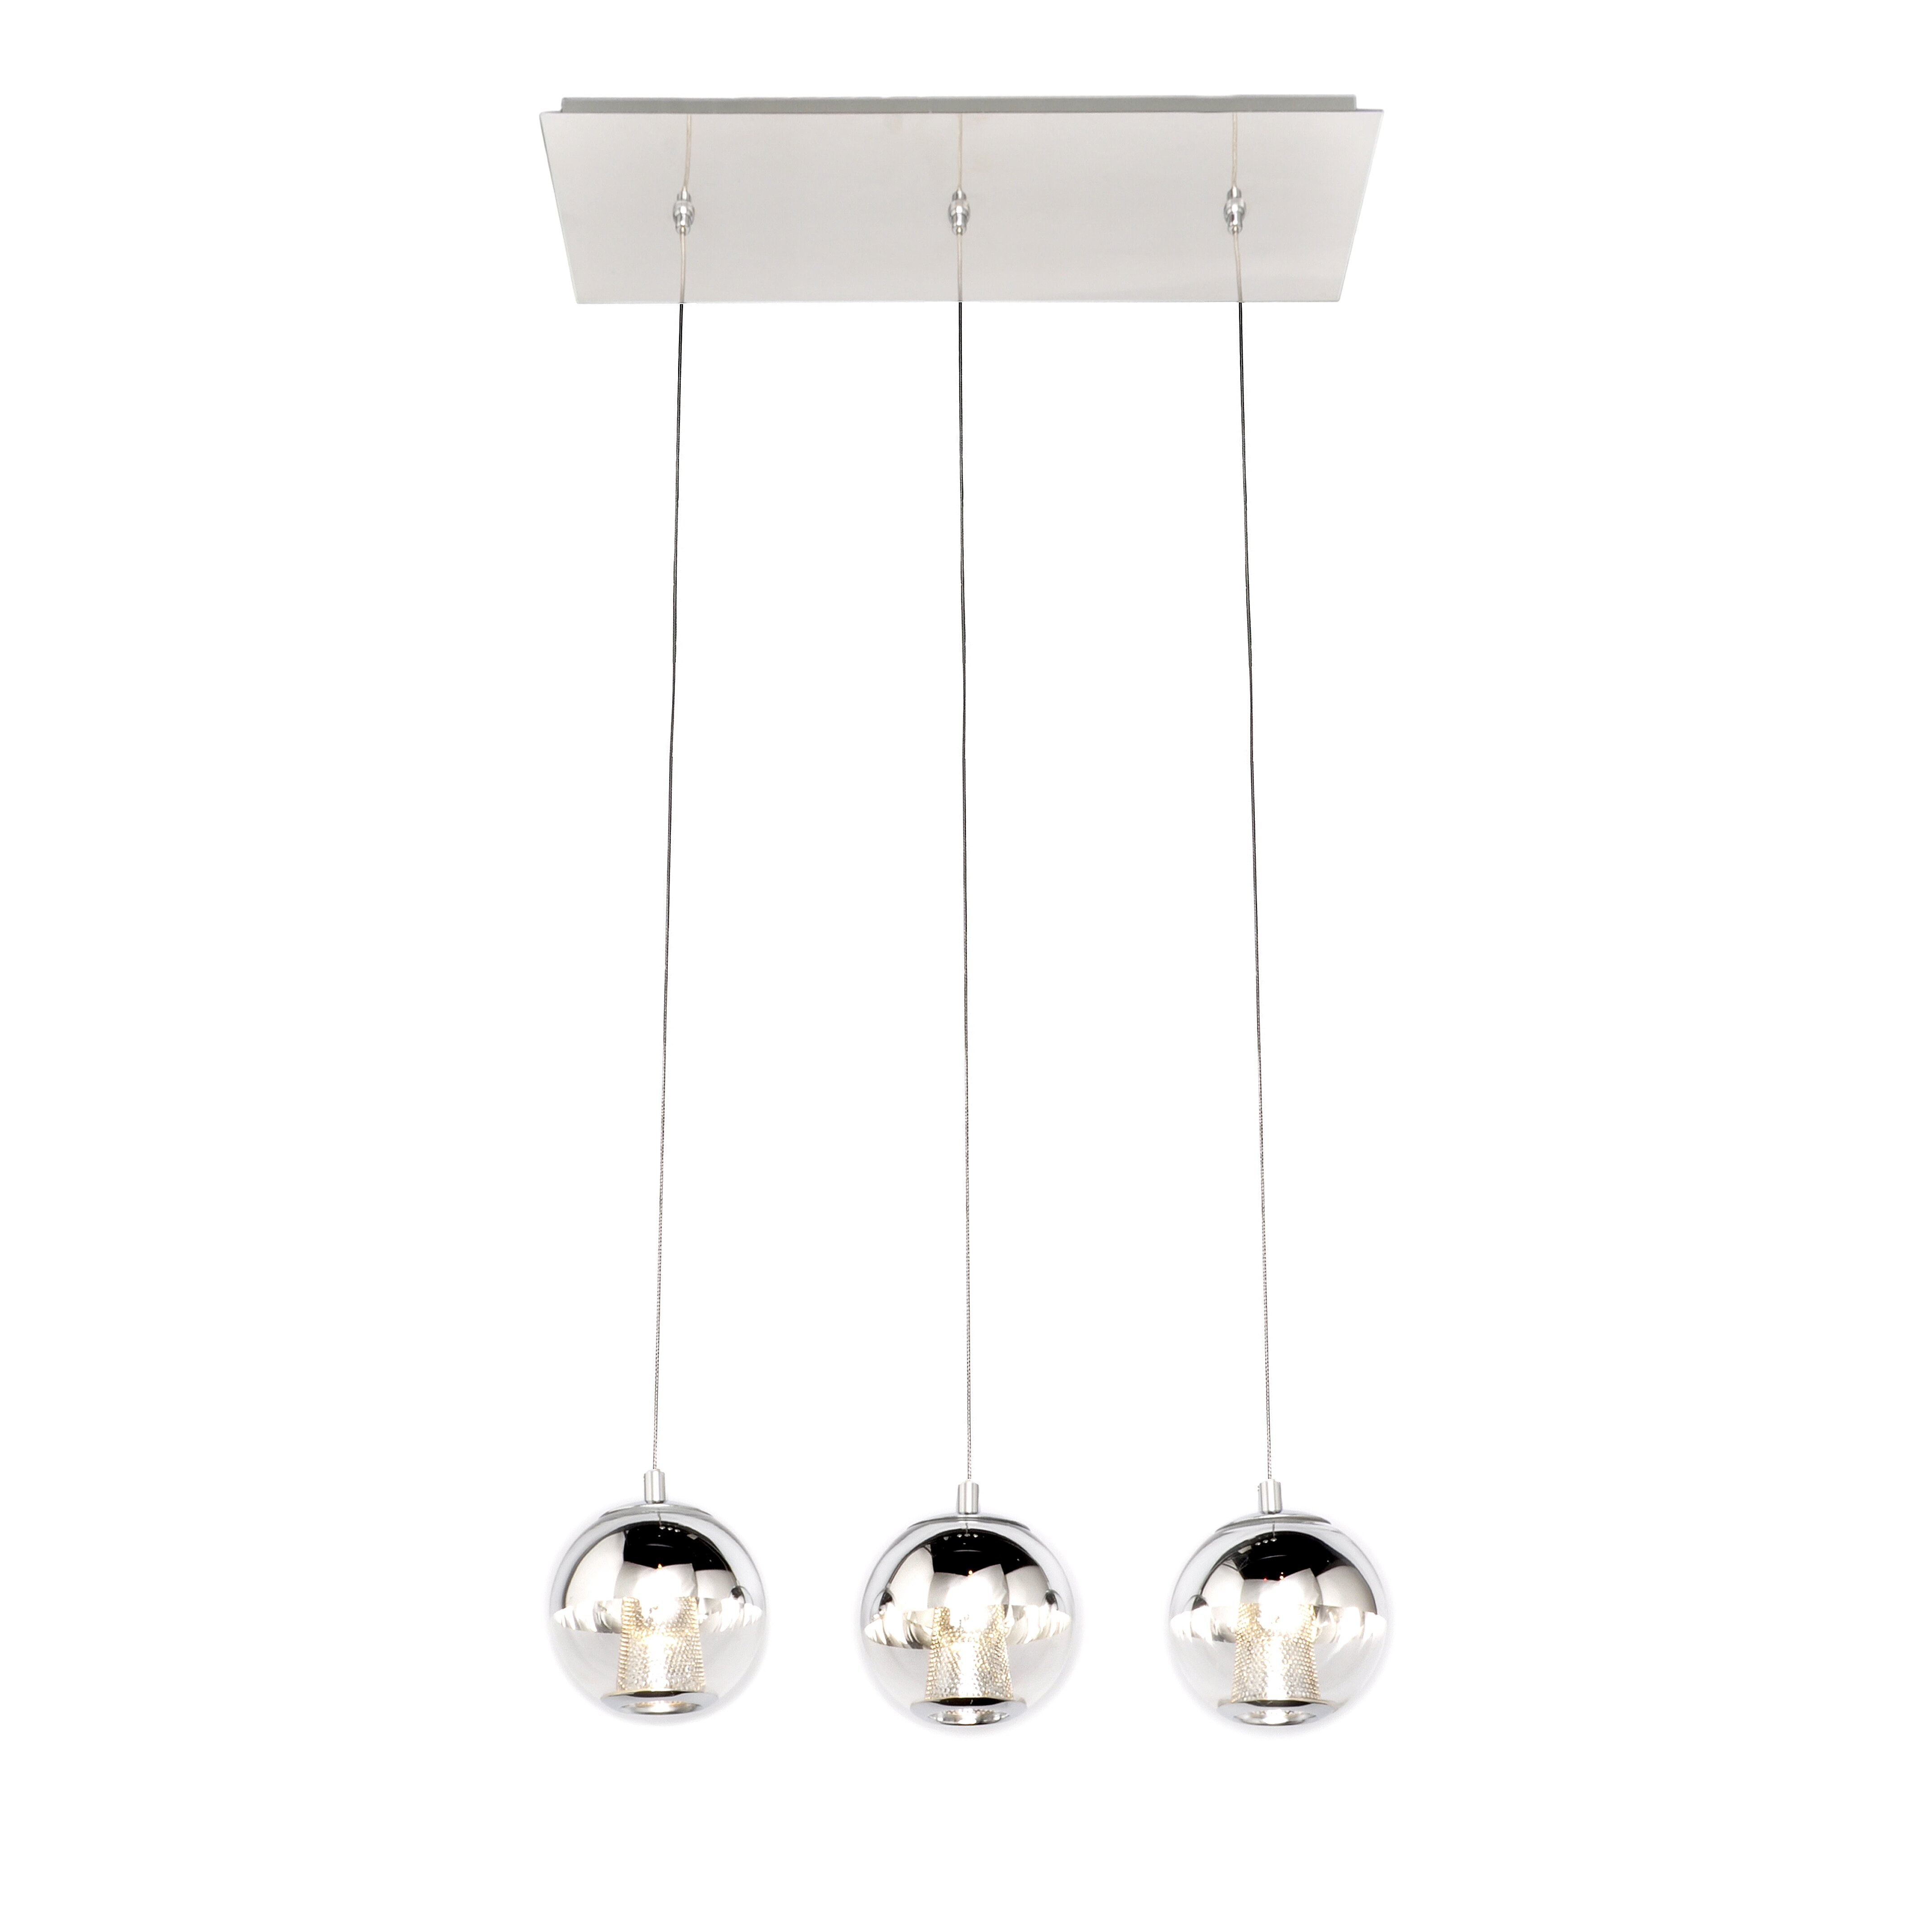 ET2 Reflex 3 LED Integrated Bulb Kitchen Island Pendant